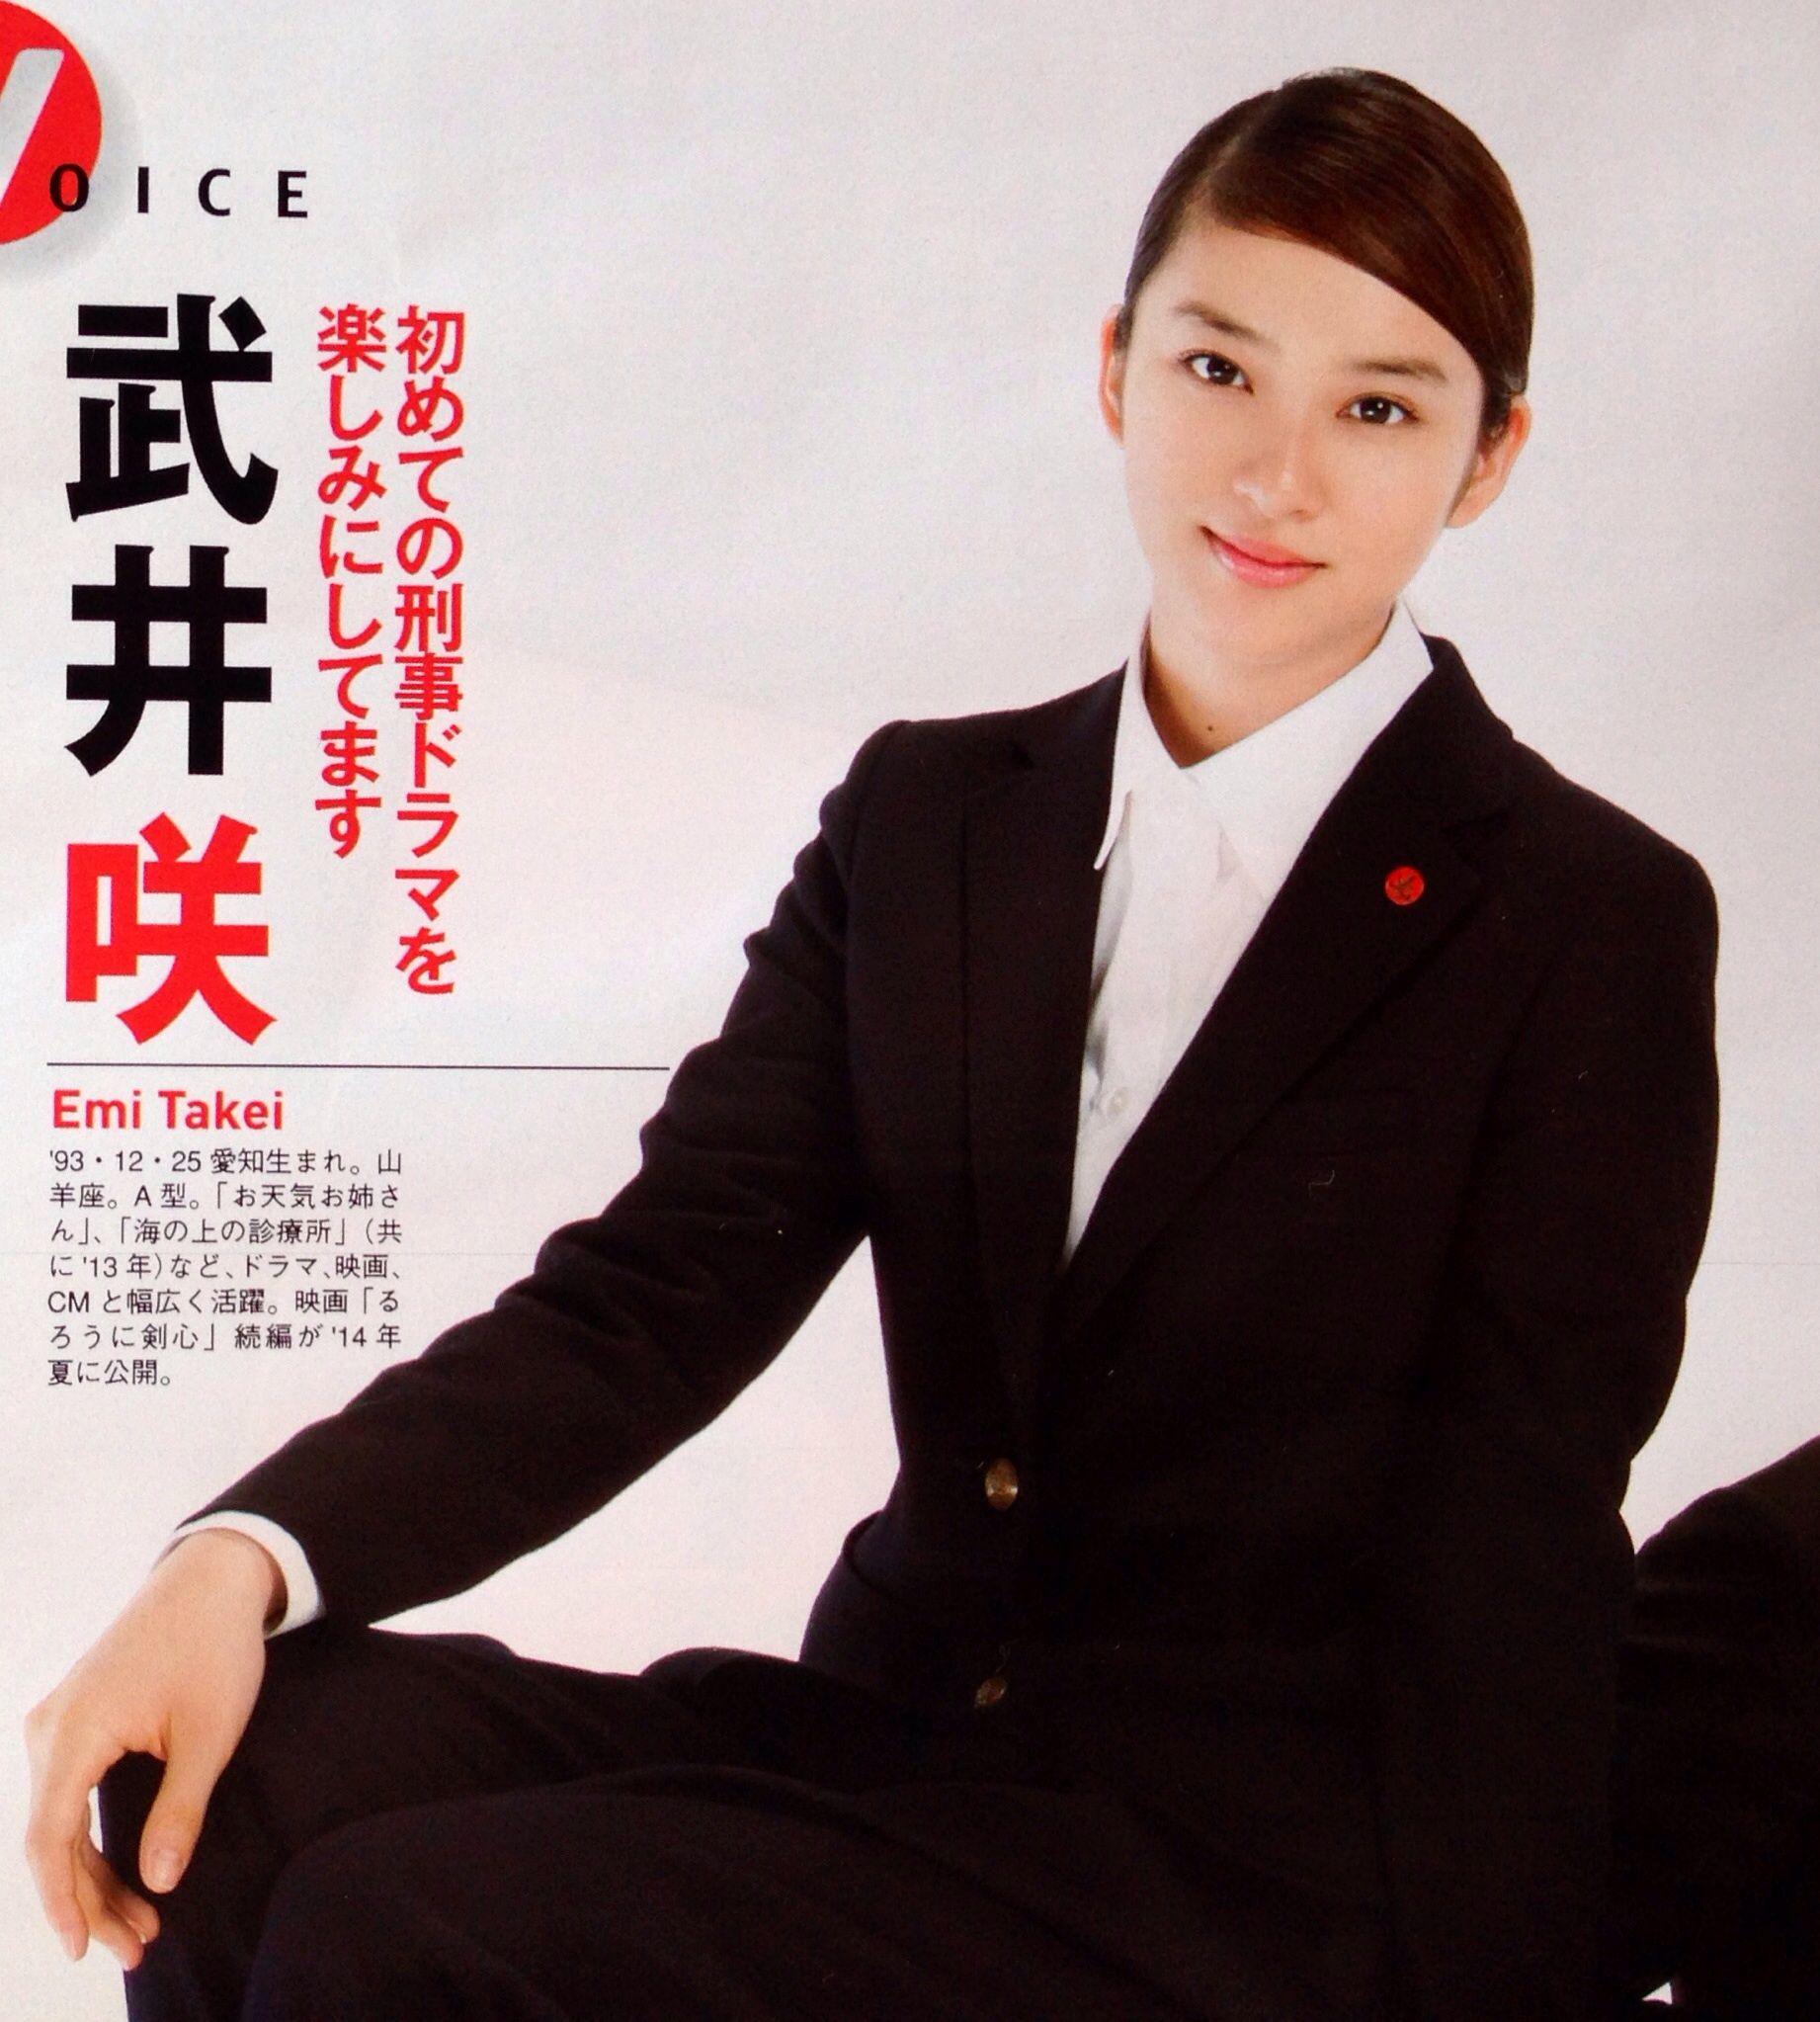 emi takei かわいい人 武井 咲 女優